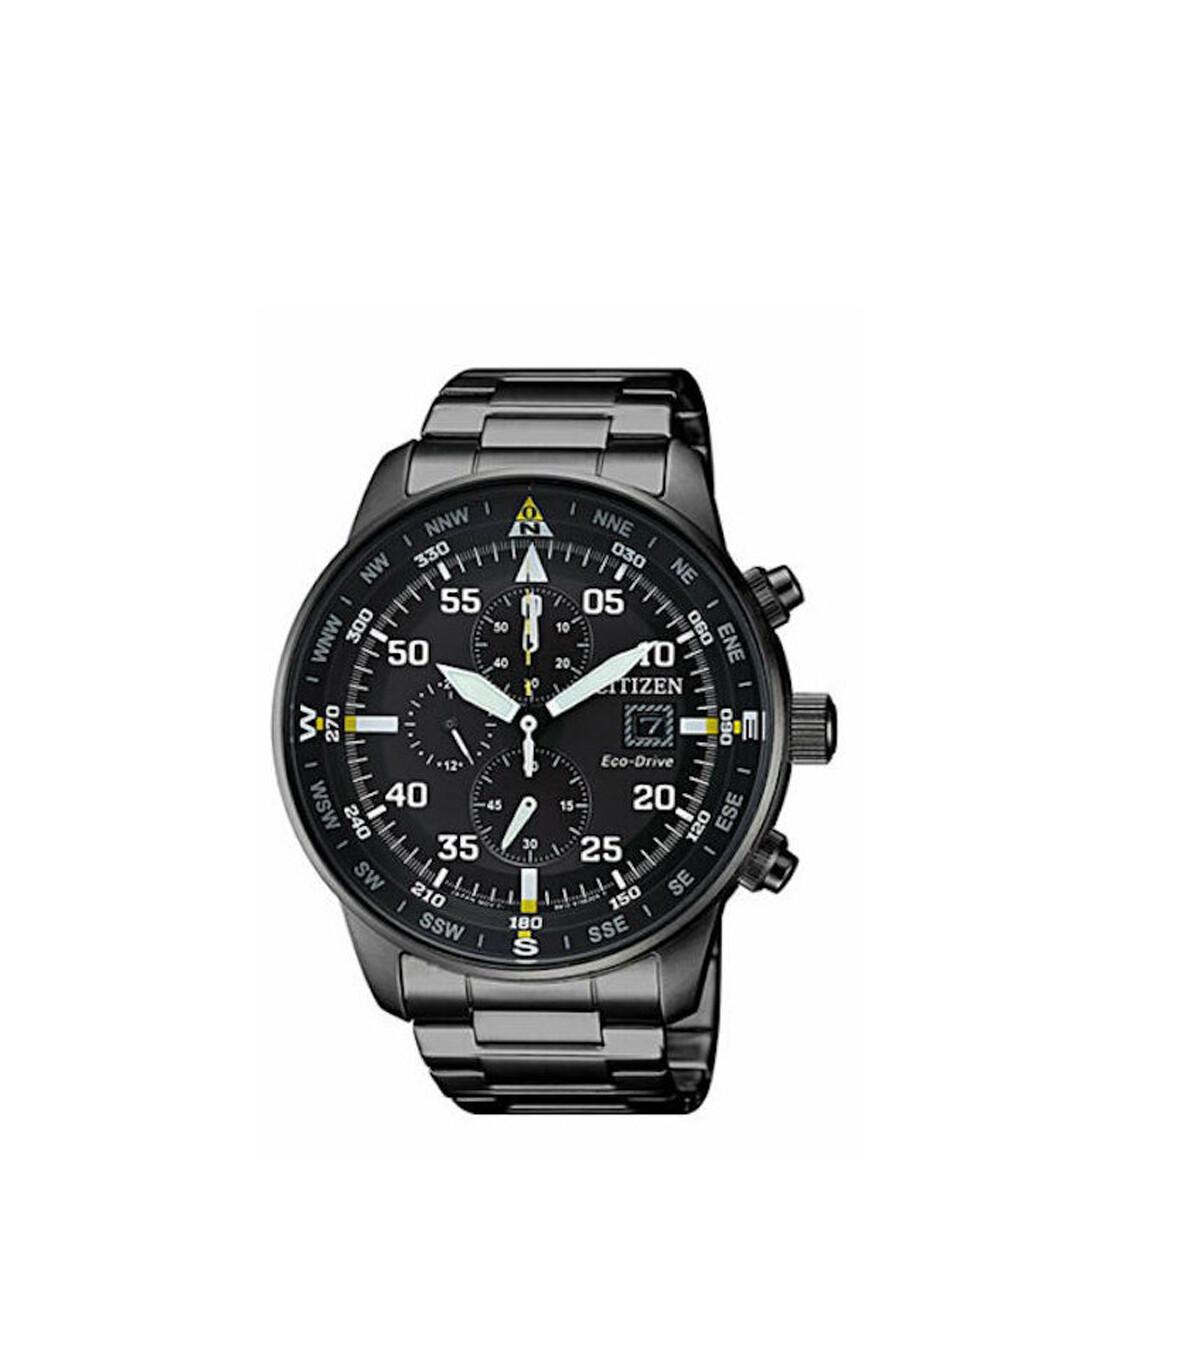 Reloj Hombre Citizen Eco-Drive Men's CA0695-50E Chronograph Black Titanium Band 44mm Watch